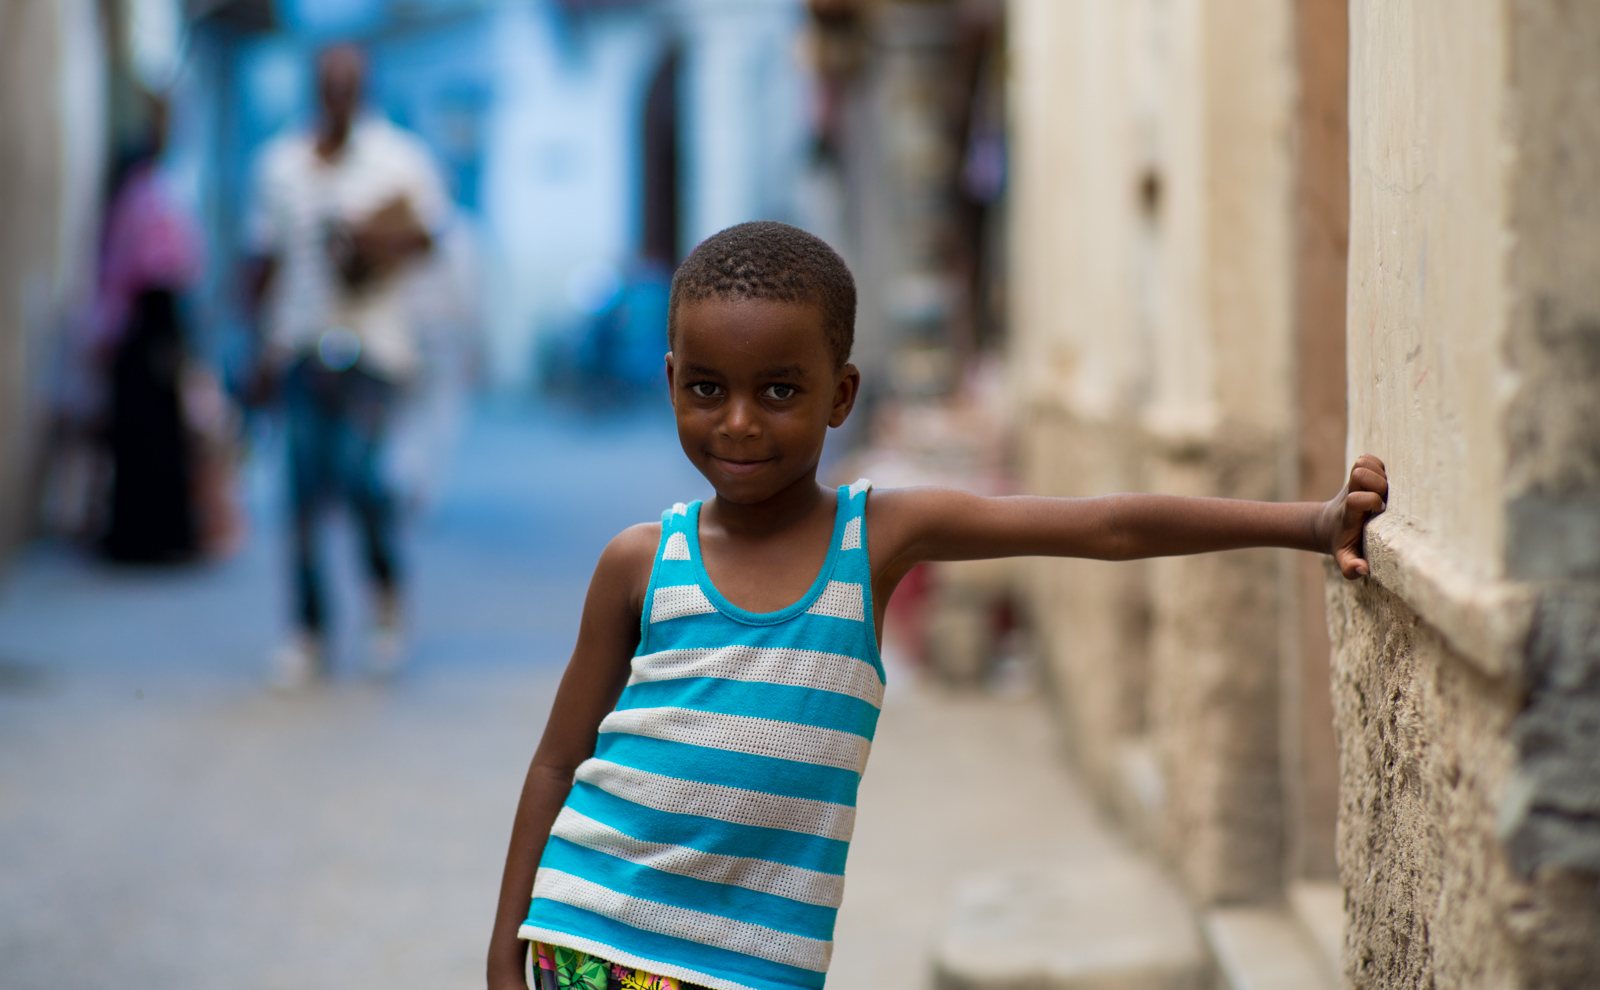 Streetkid in Stone Town of Zanzibar